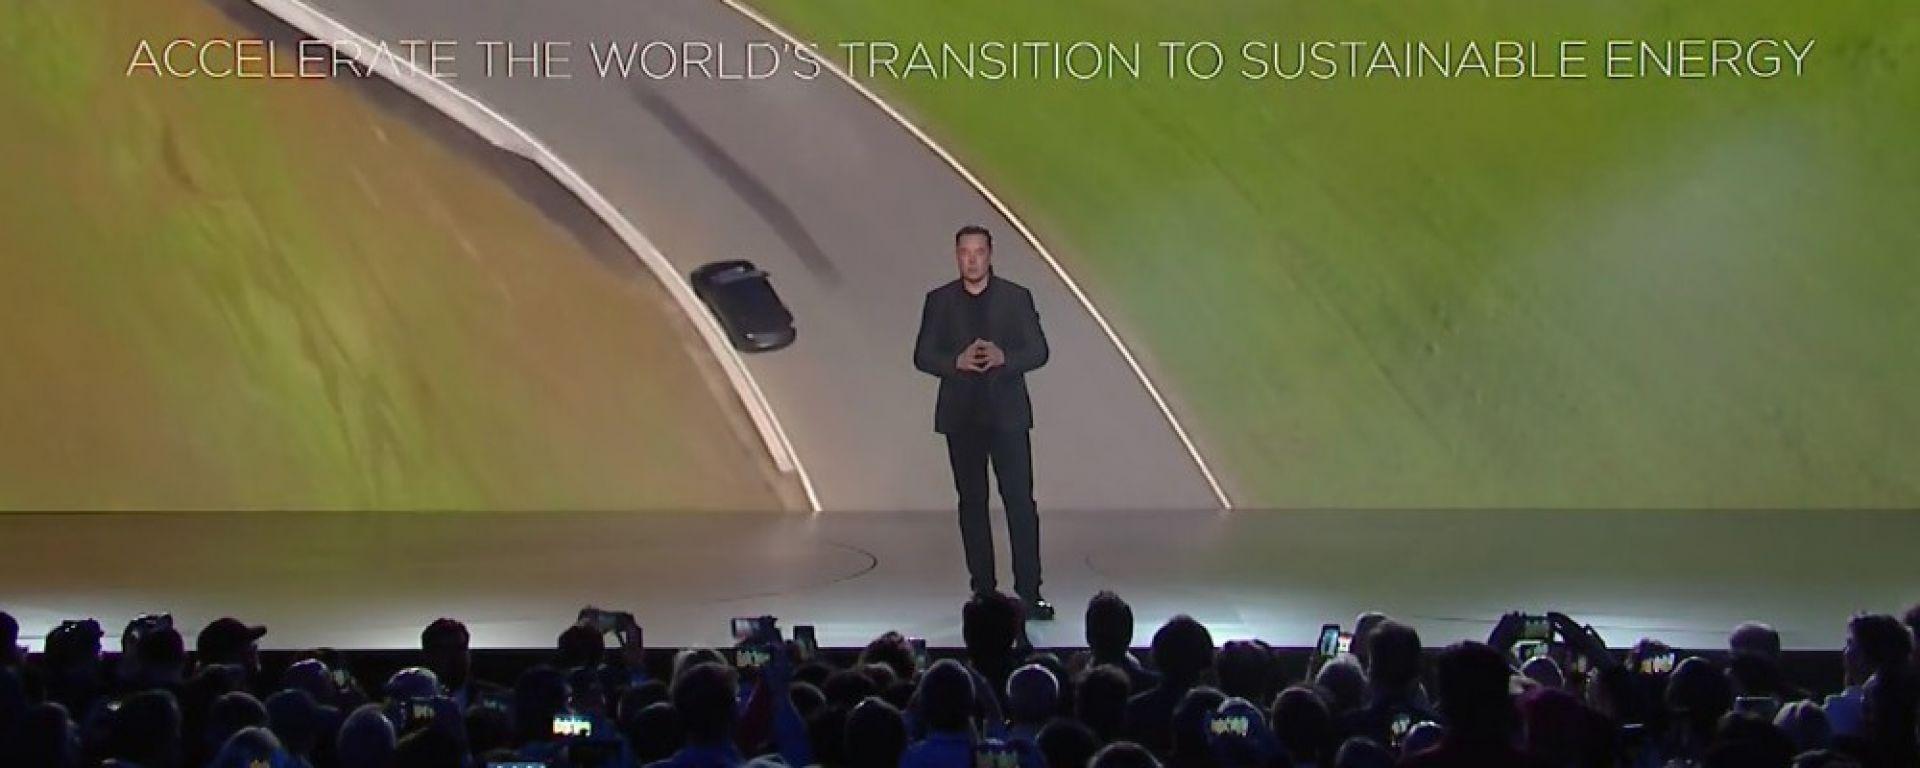 Tesla: Elon Musk svela il nuovo Master Plan